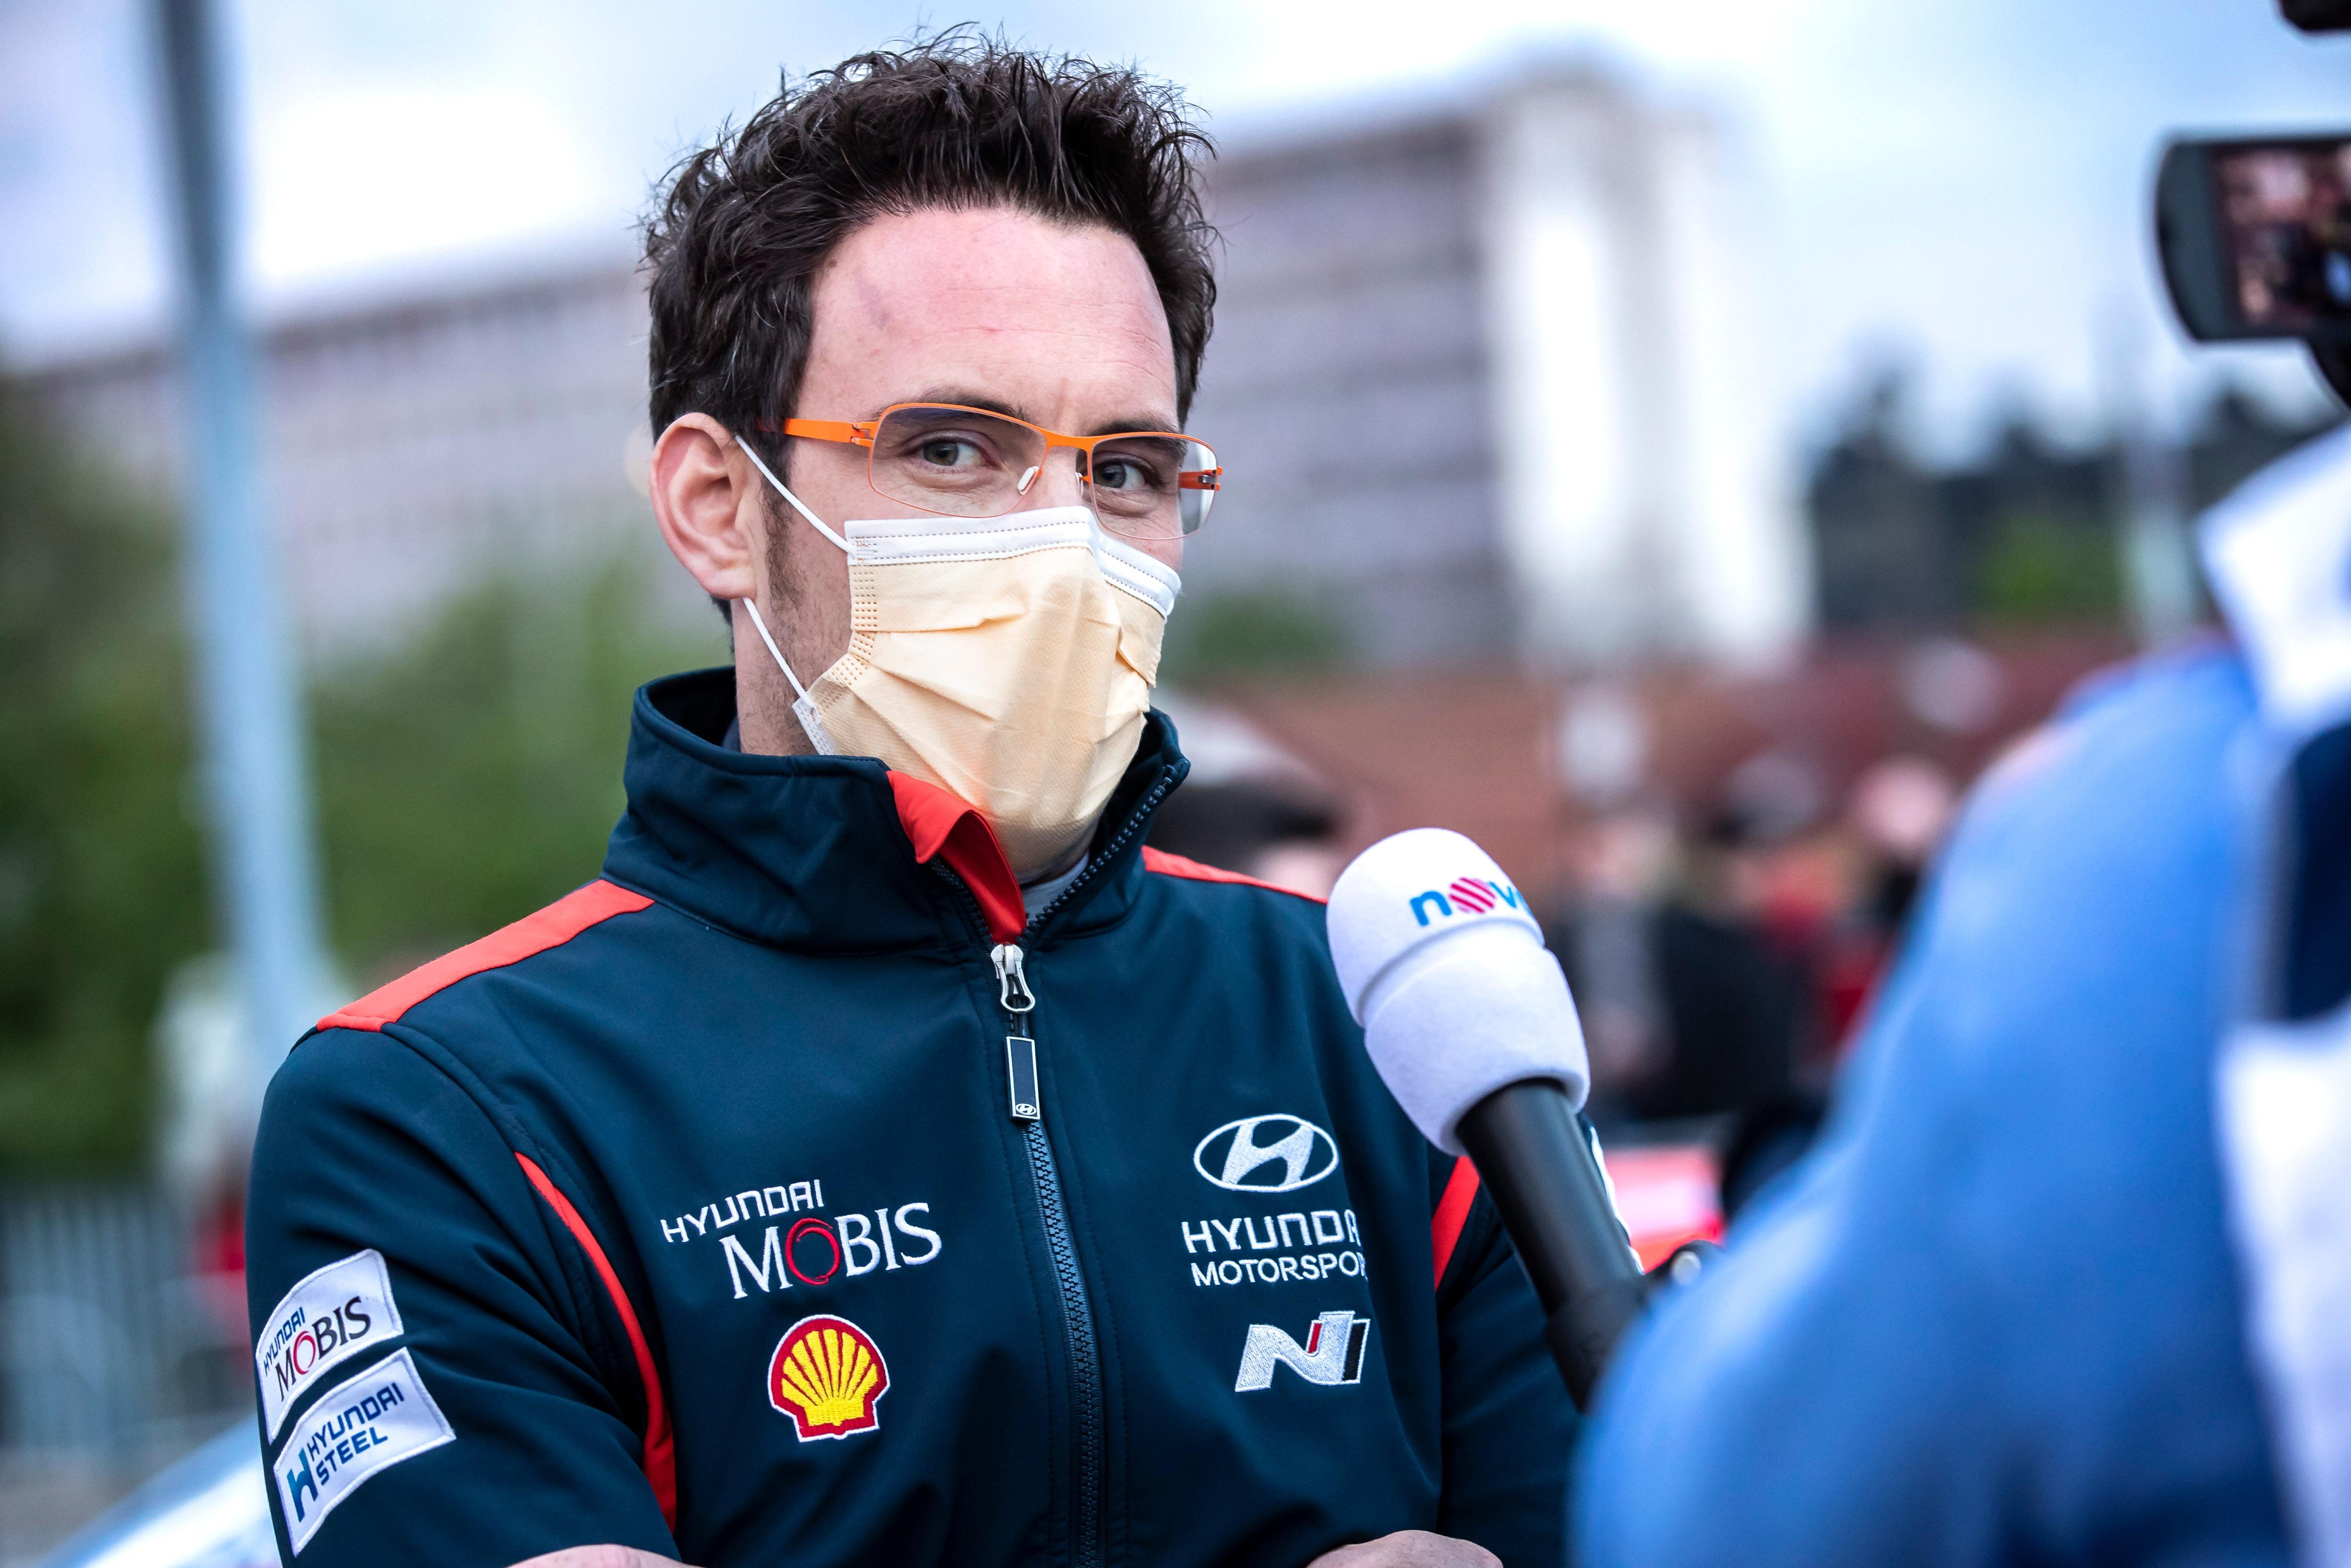 Thierry Neuville, Rally Croatia 2021